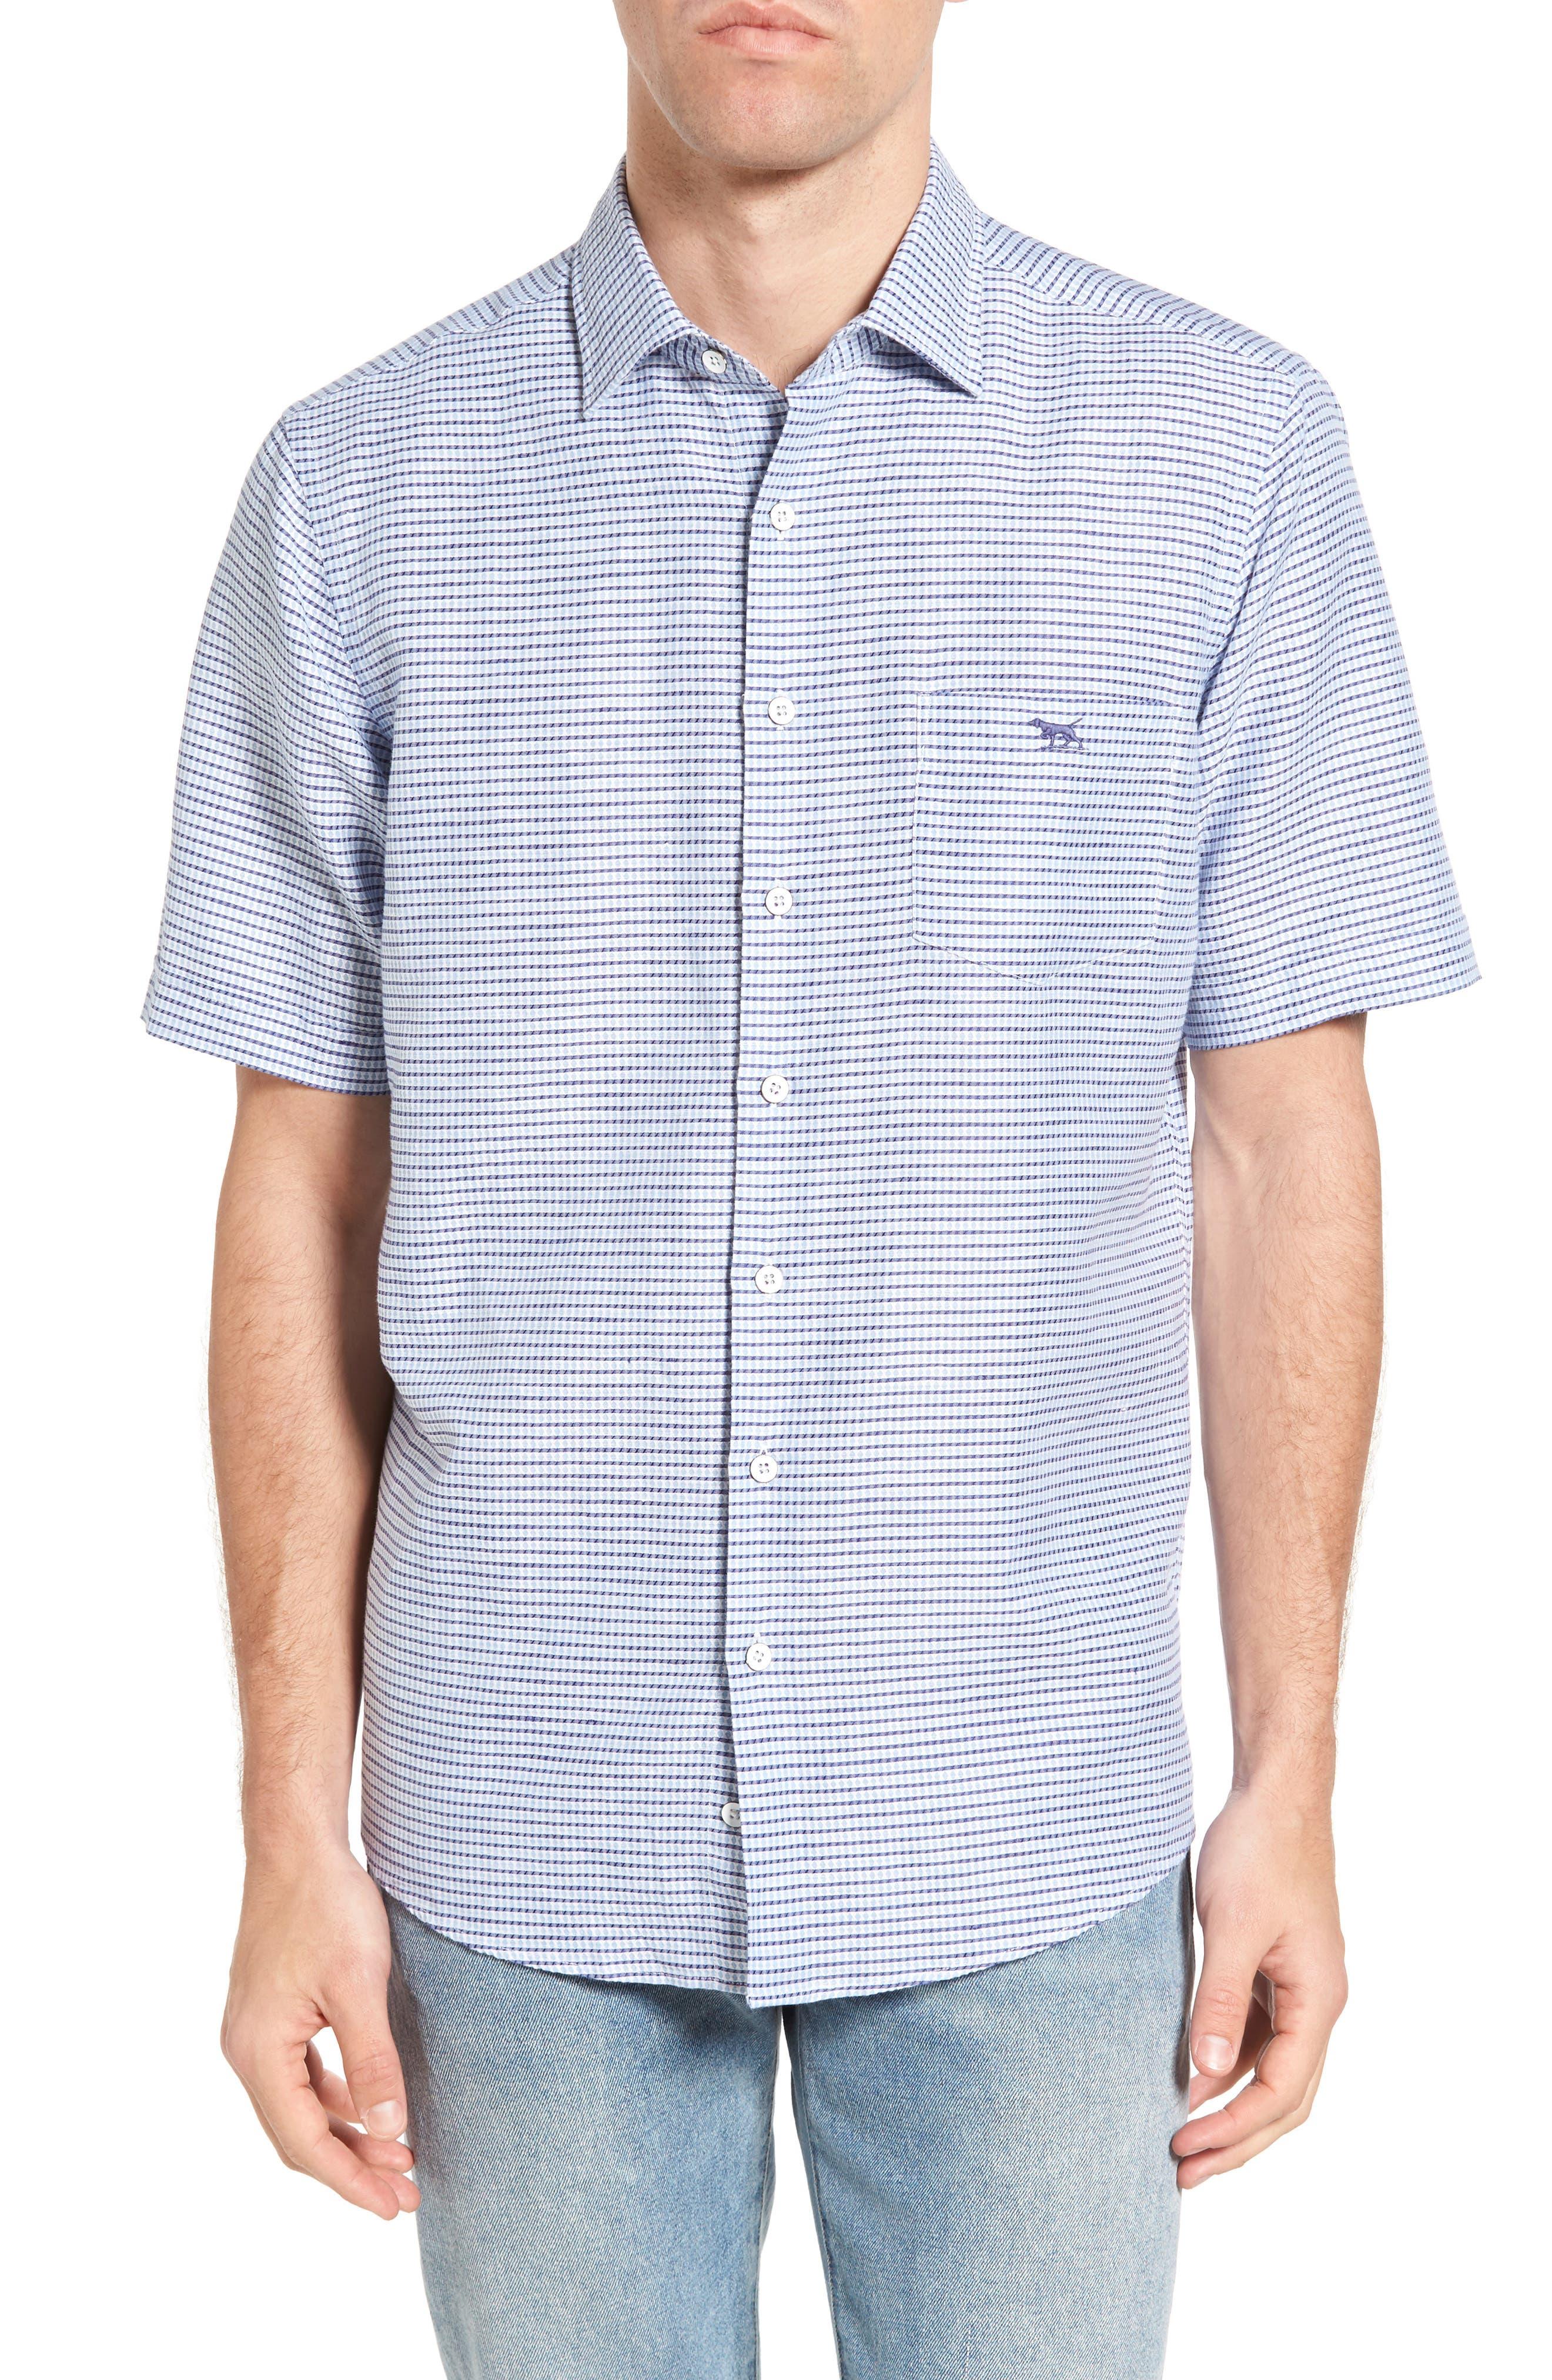 Main Image - Rodd & Gunn Upper Hutt Original Fit Sport Shirt